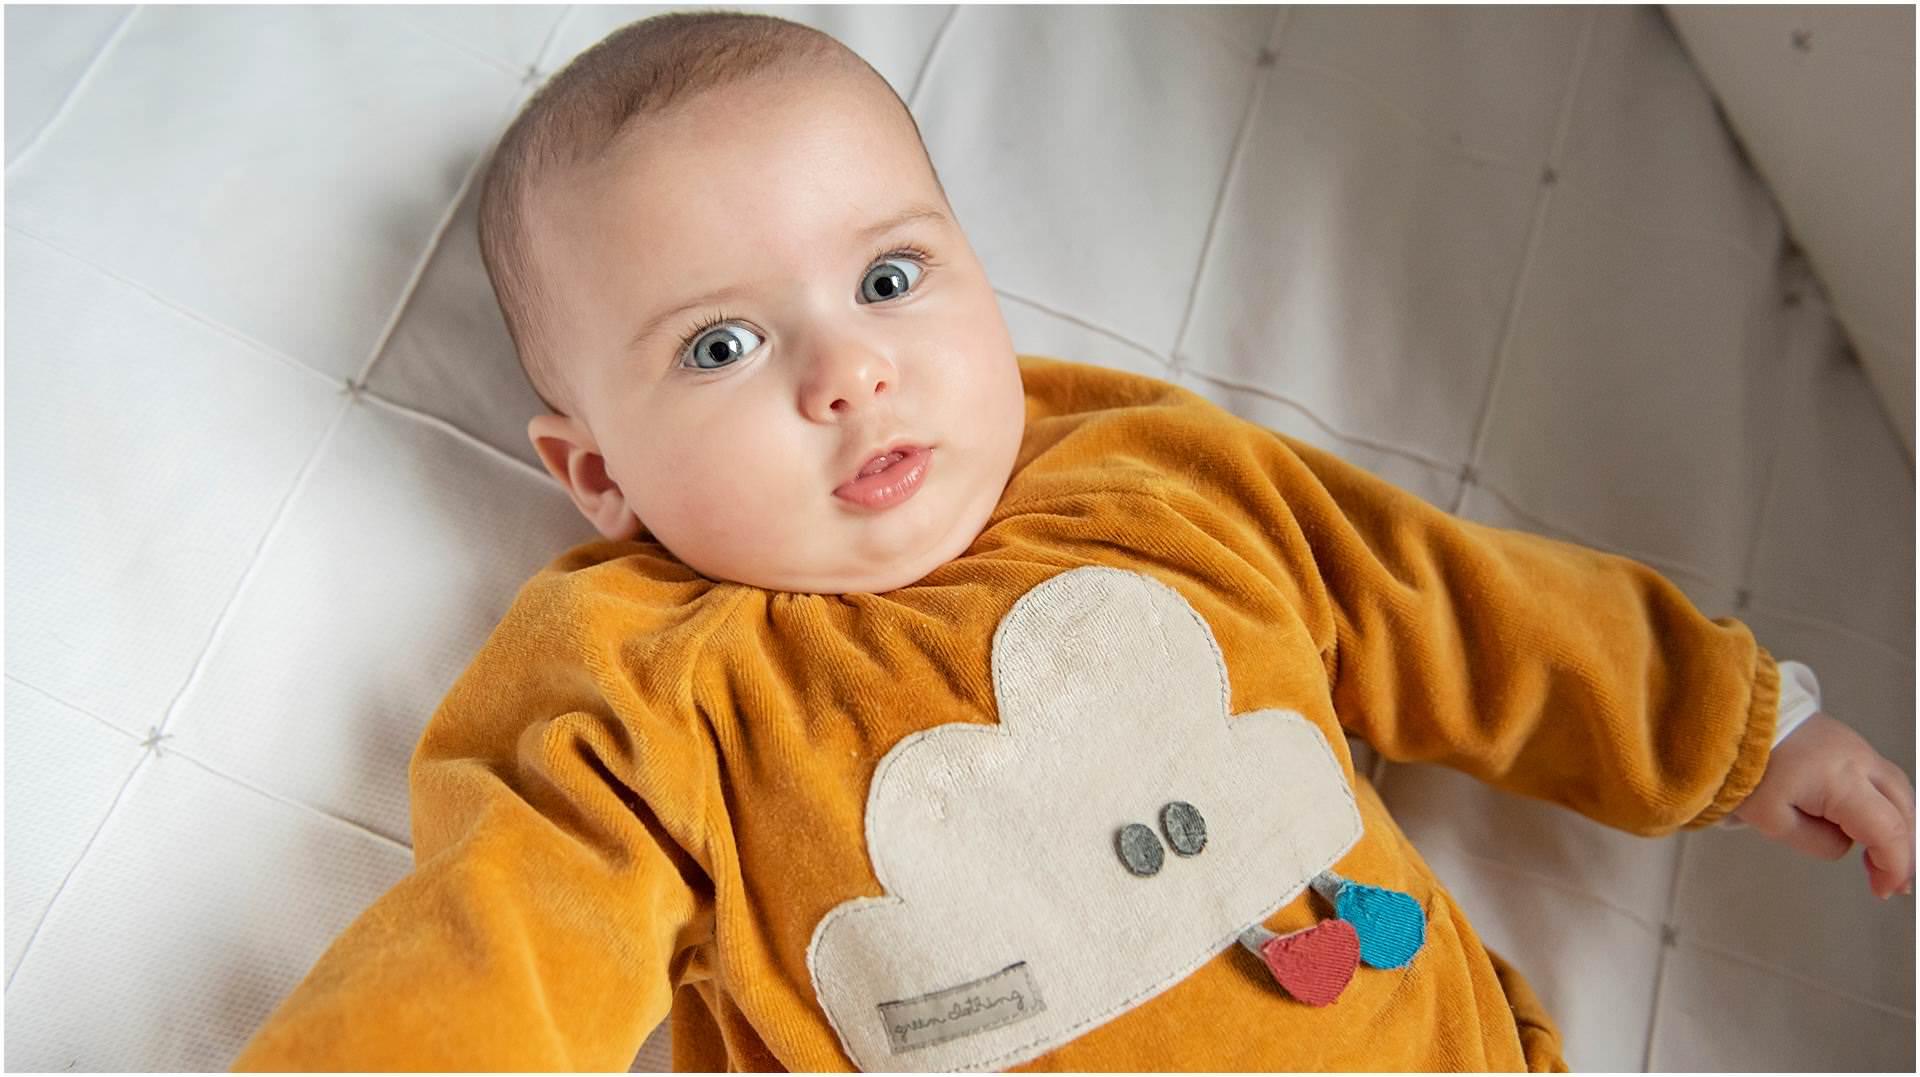 Newborn_photography with Sarah_bee_photography lifestyle_photography family_photography natural_photography photography_in_your_own_home baby_and_child_photography_1951.jpg